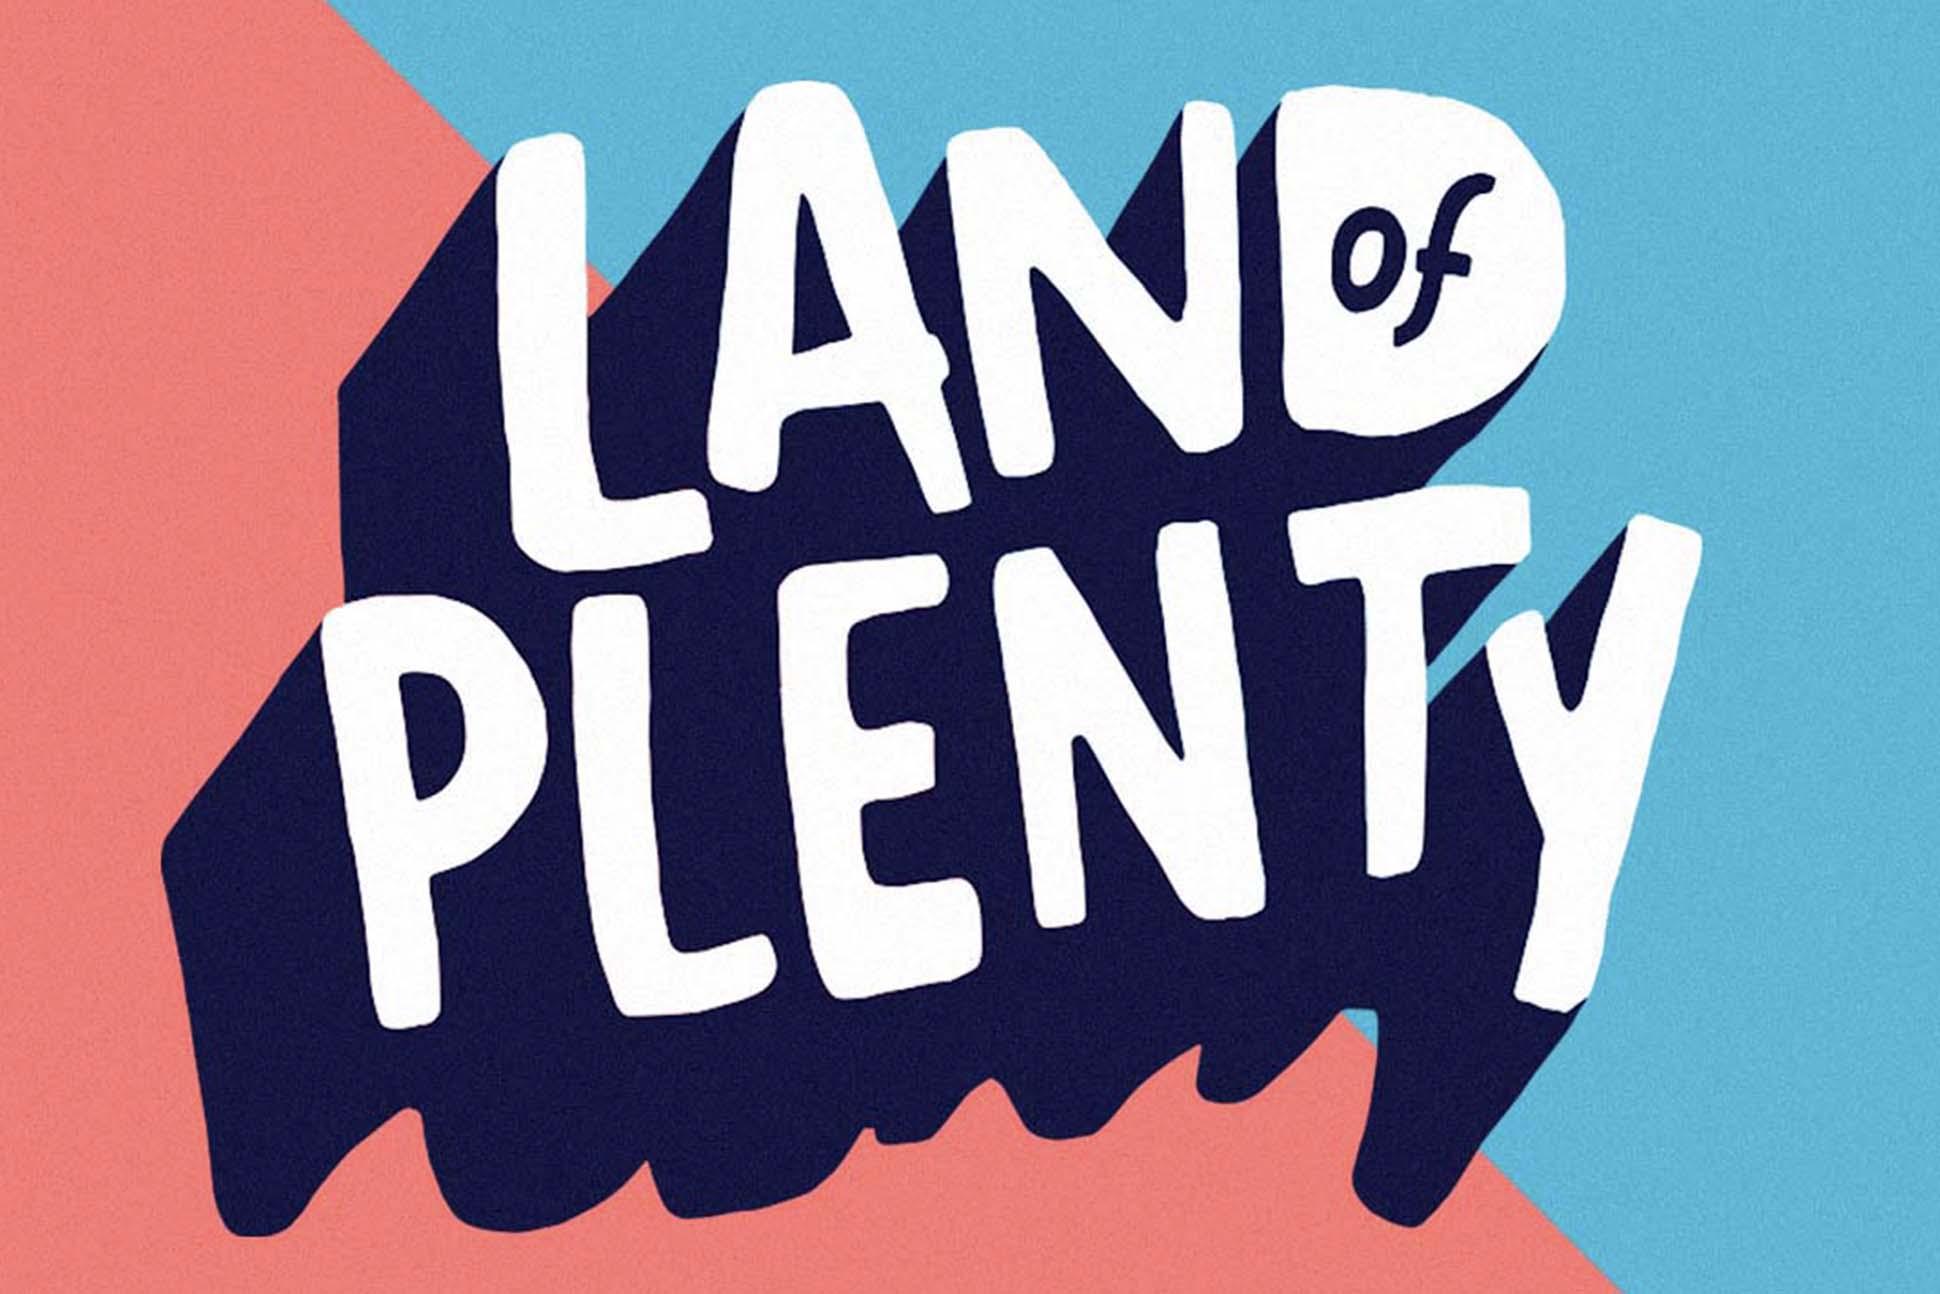 'Something To Look Forward To': Land Of PlentyFestival To Return In 2020